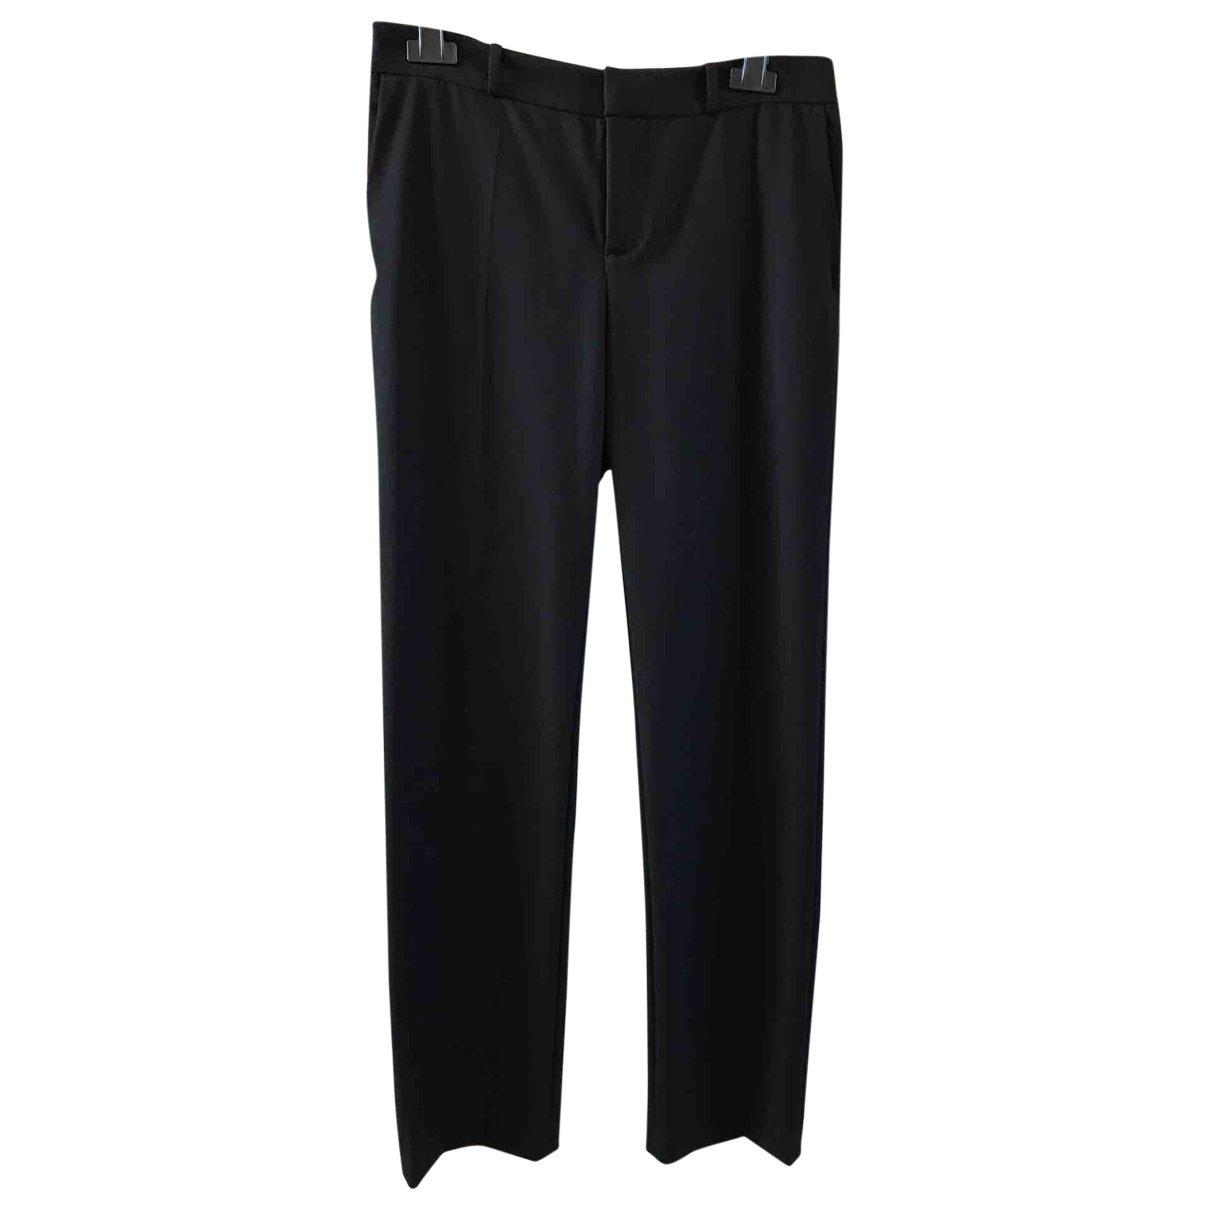 Les Petites \N Black Trousers for Women 38 FR